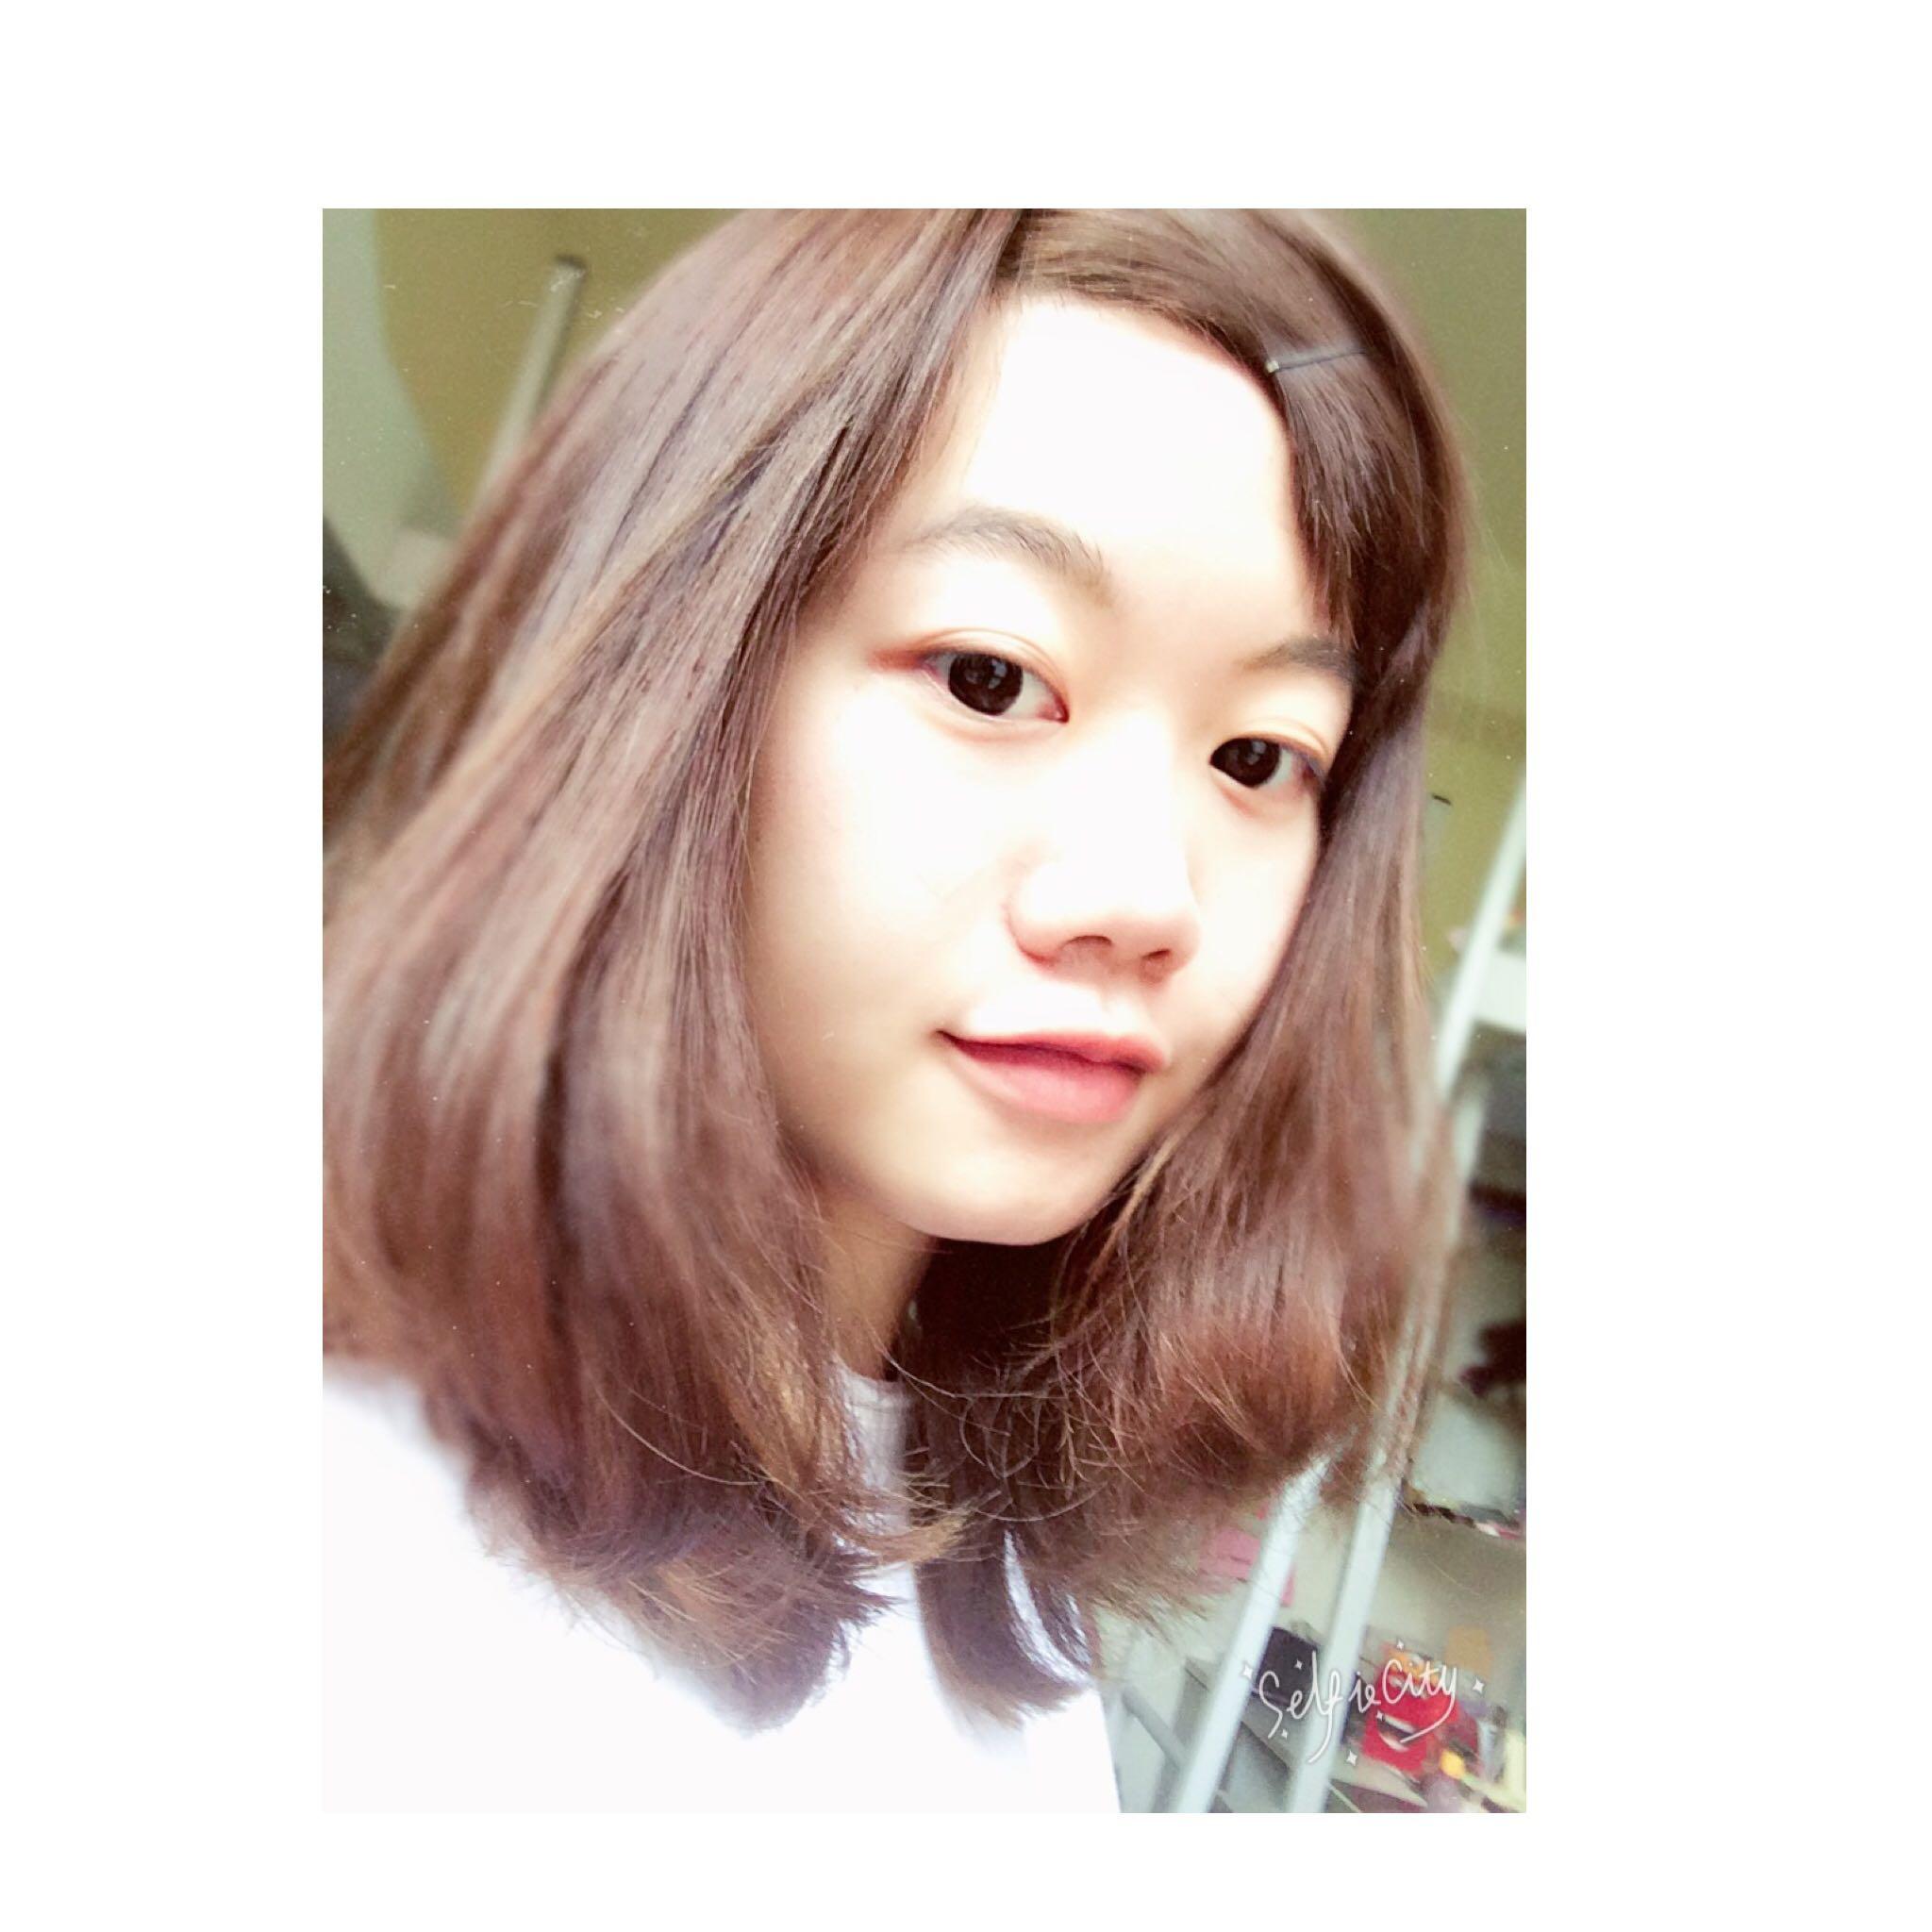 annbearhuang